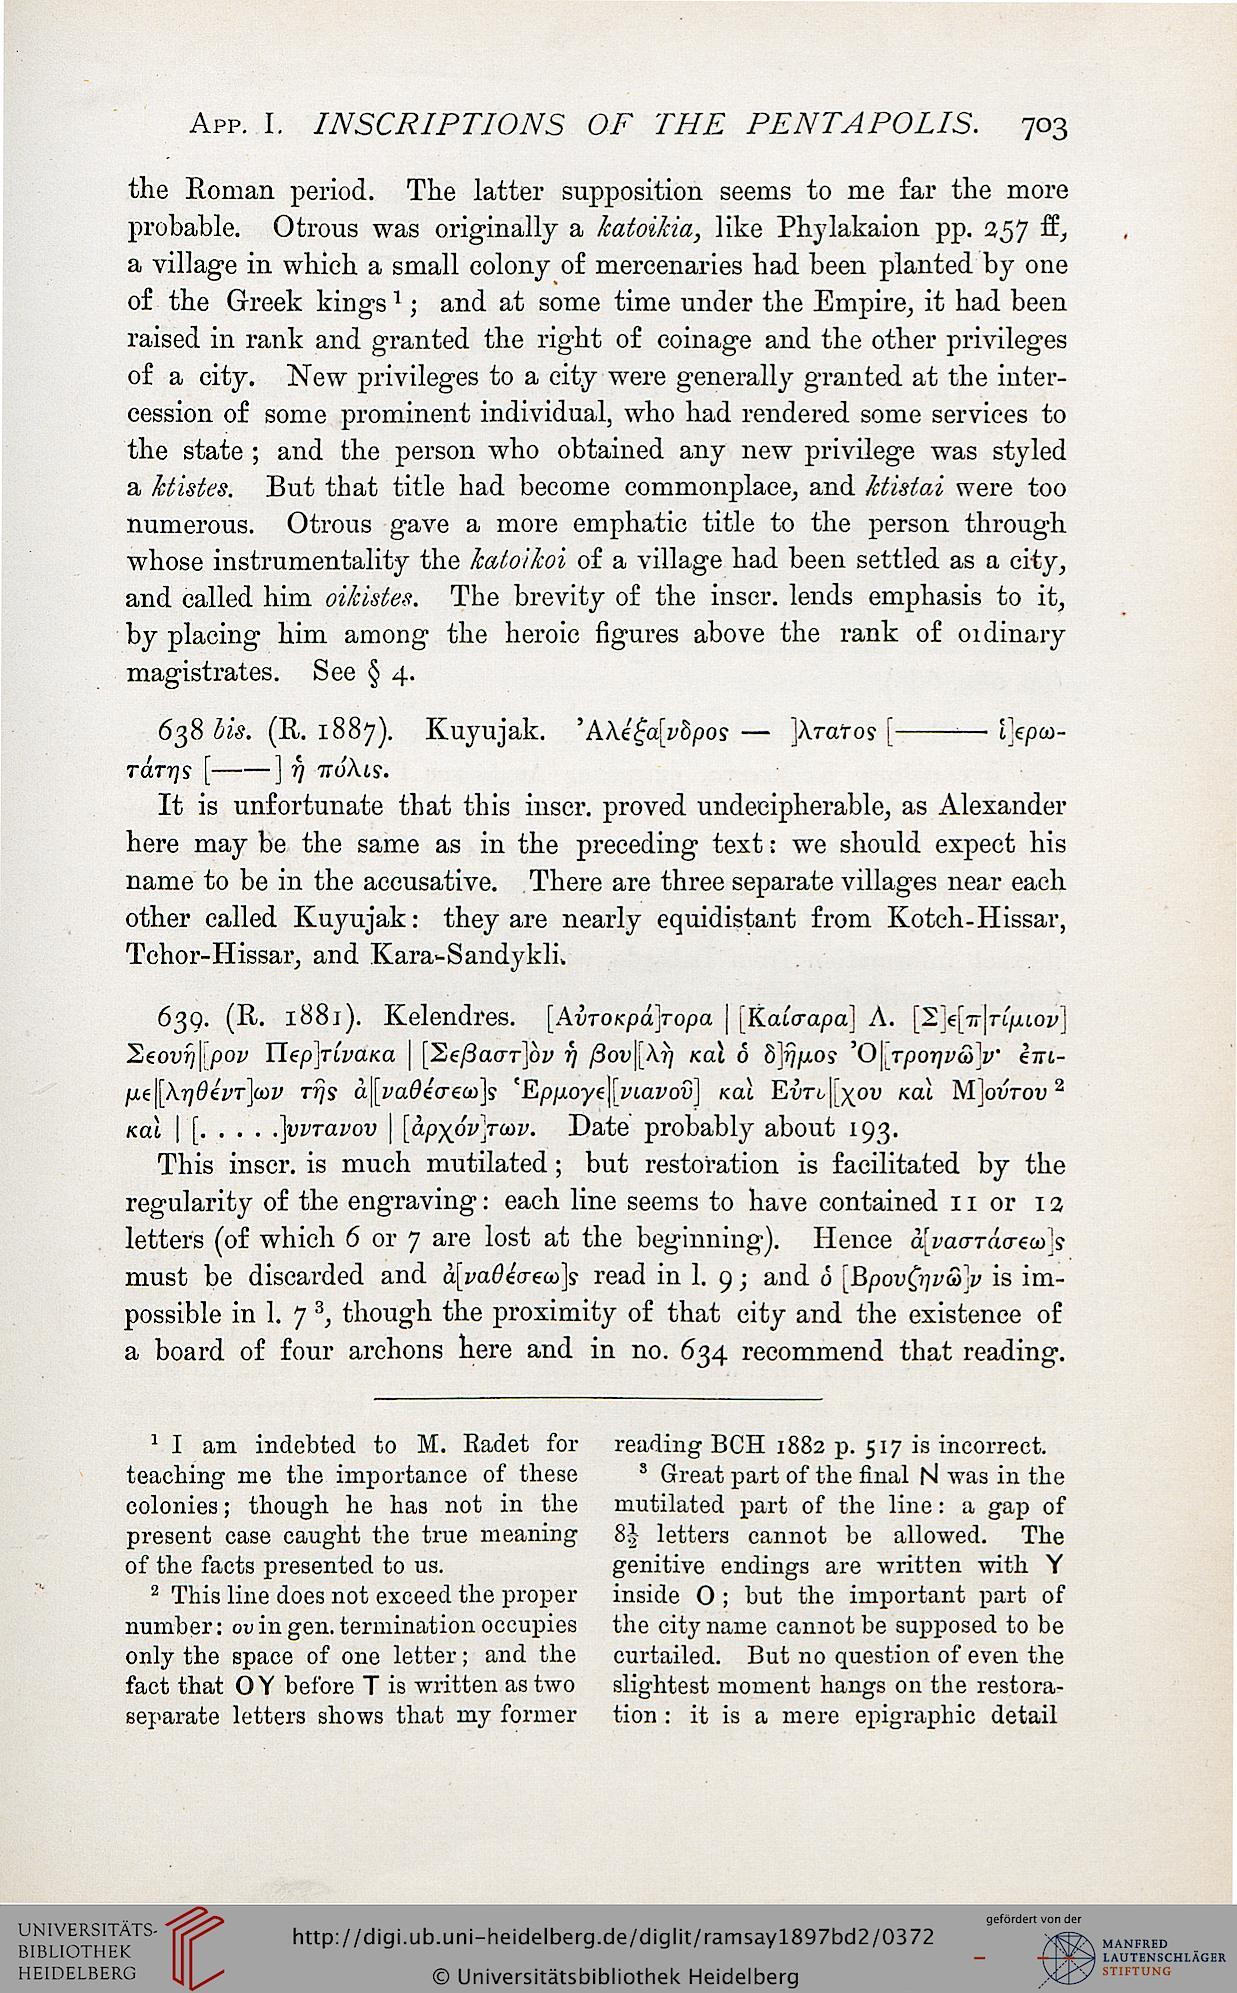 Ramsay, William Mitchell: The cities and bishoprics of